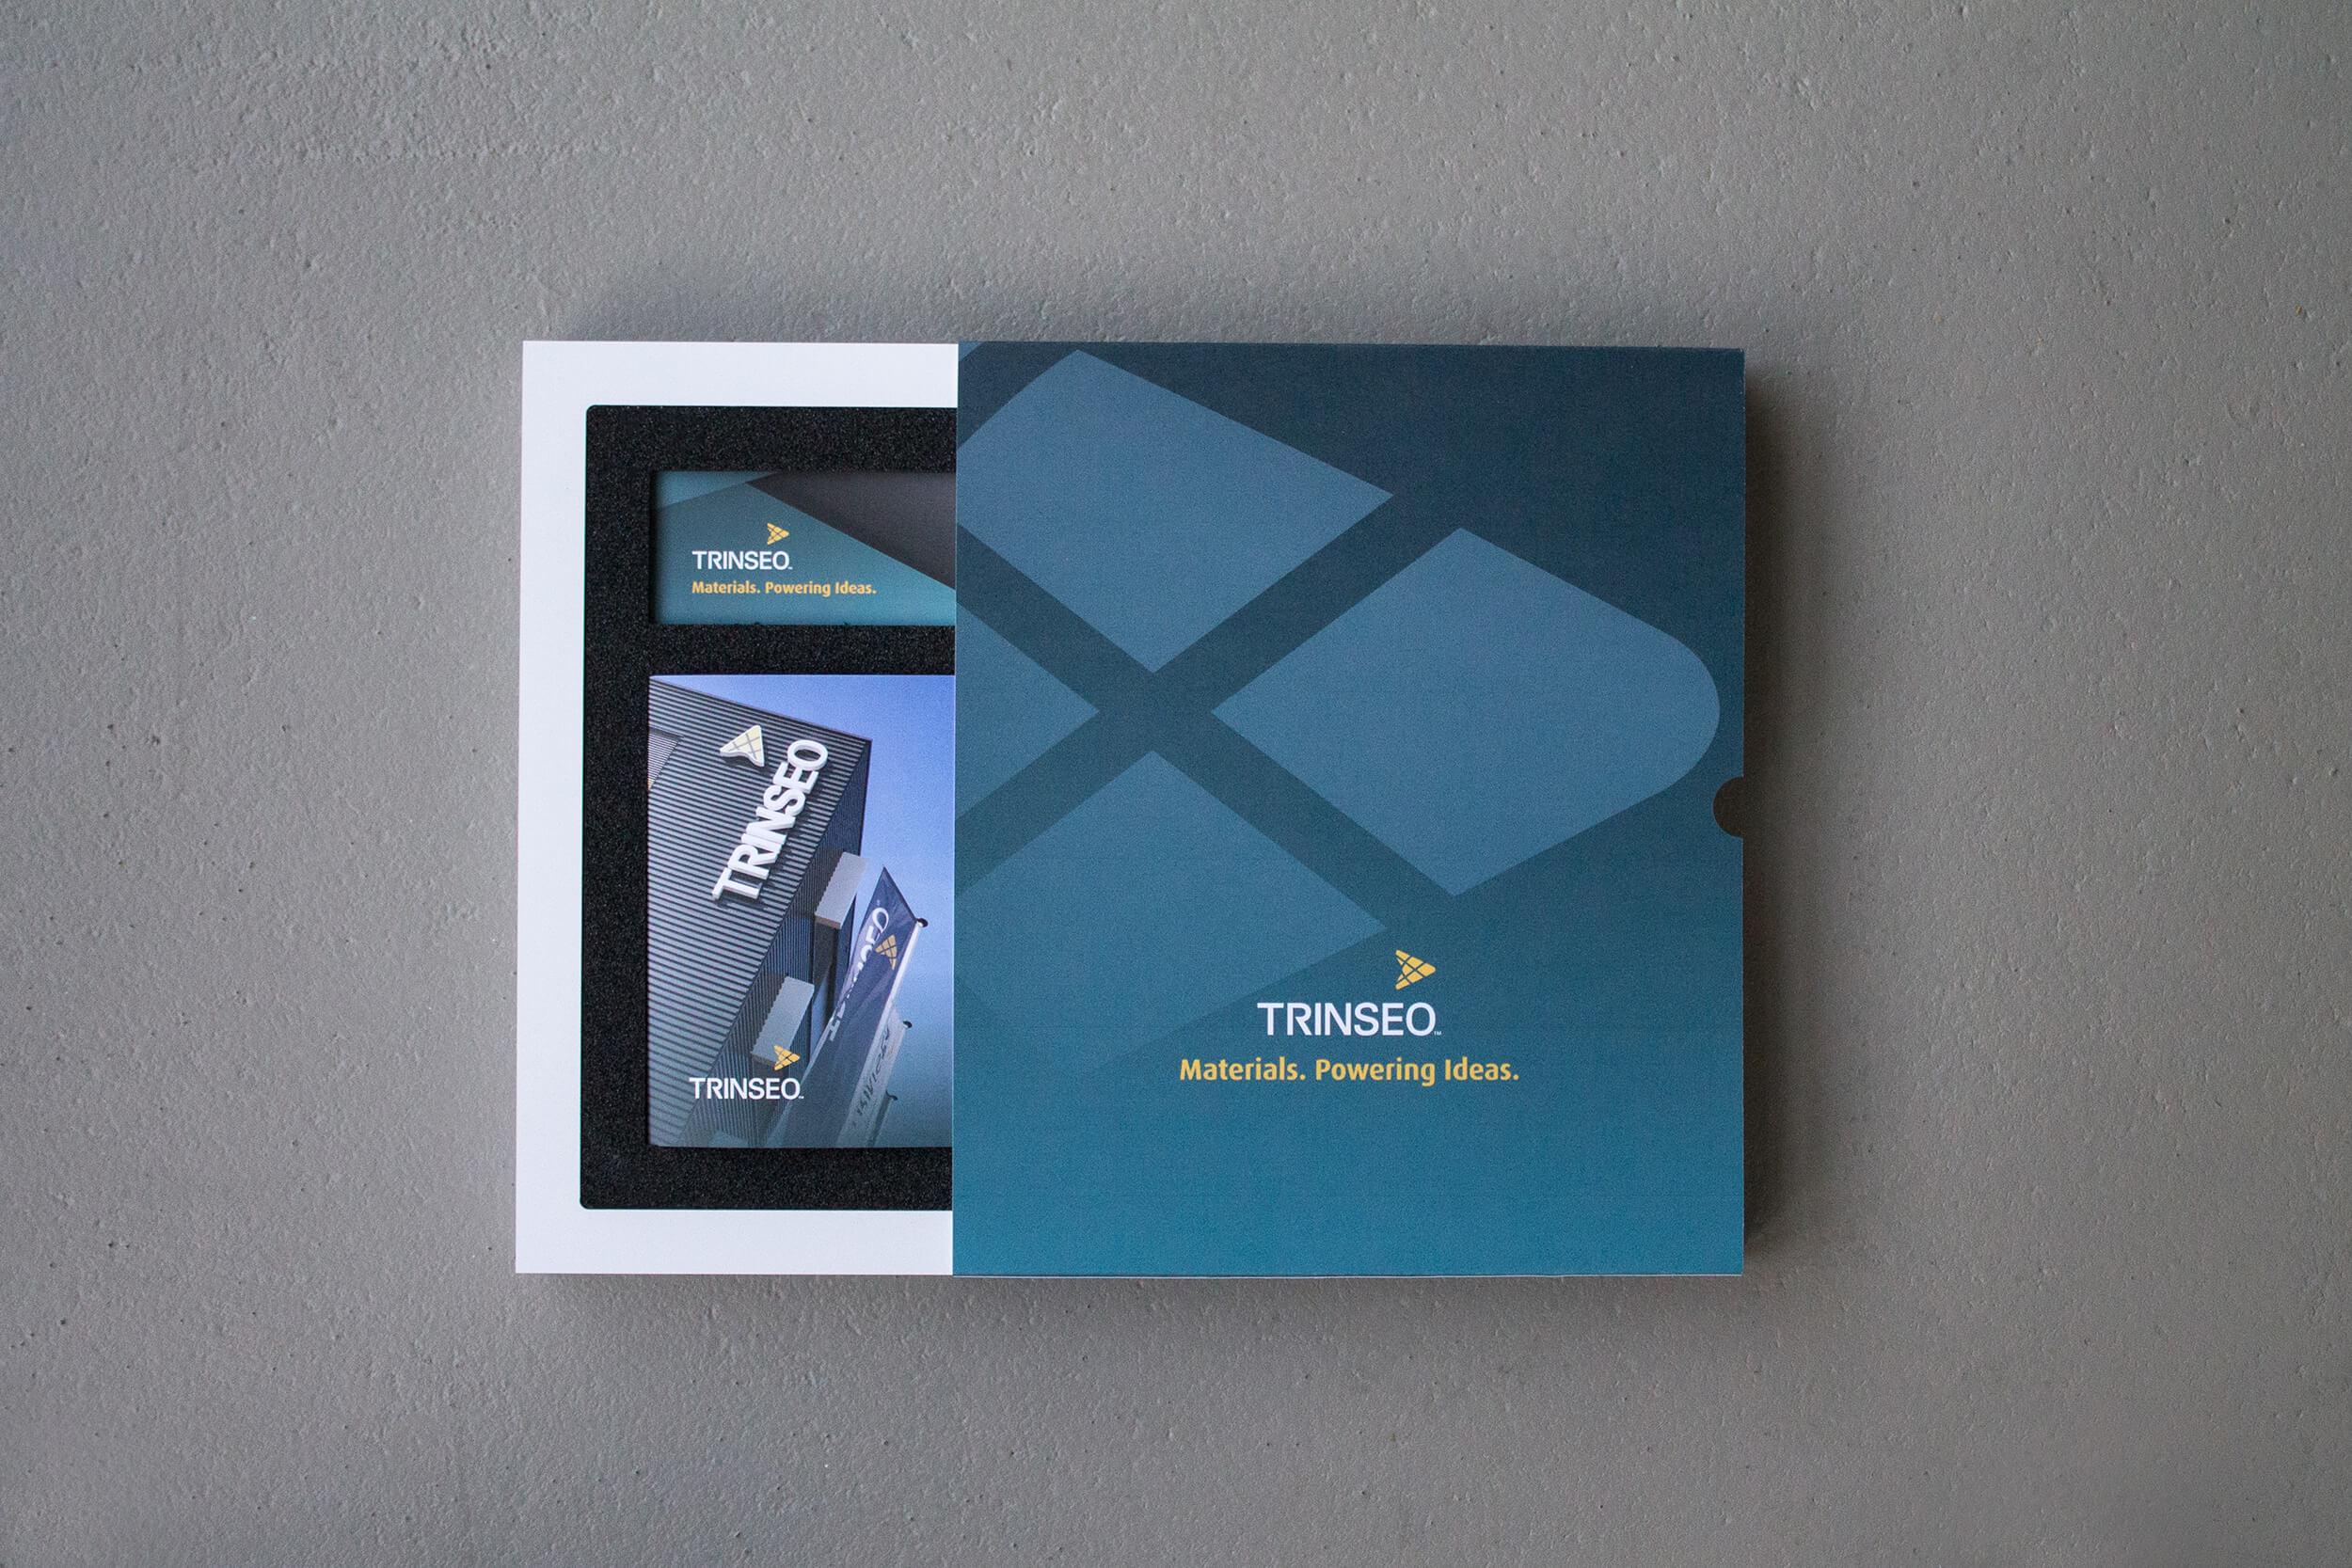 Trinseo-box-3.jpg